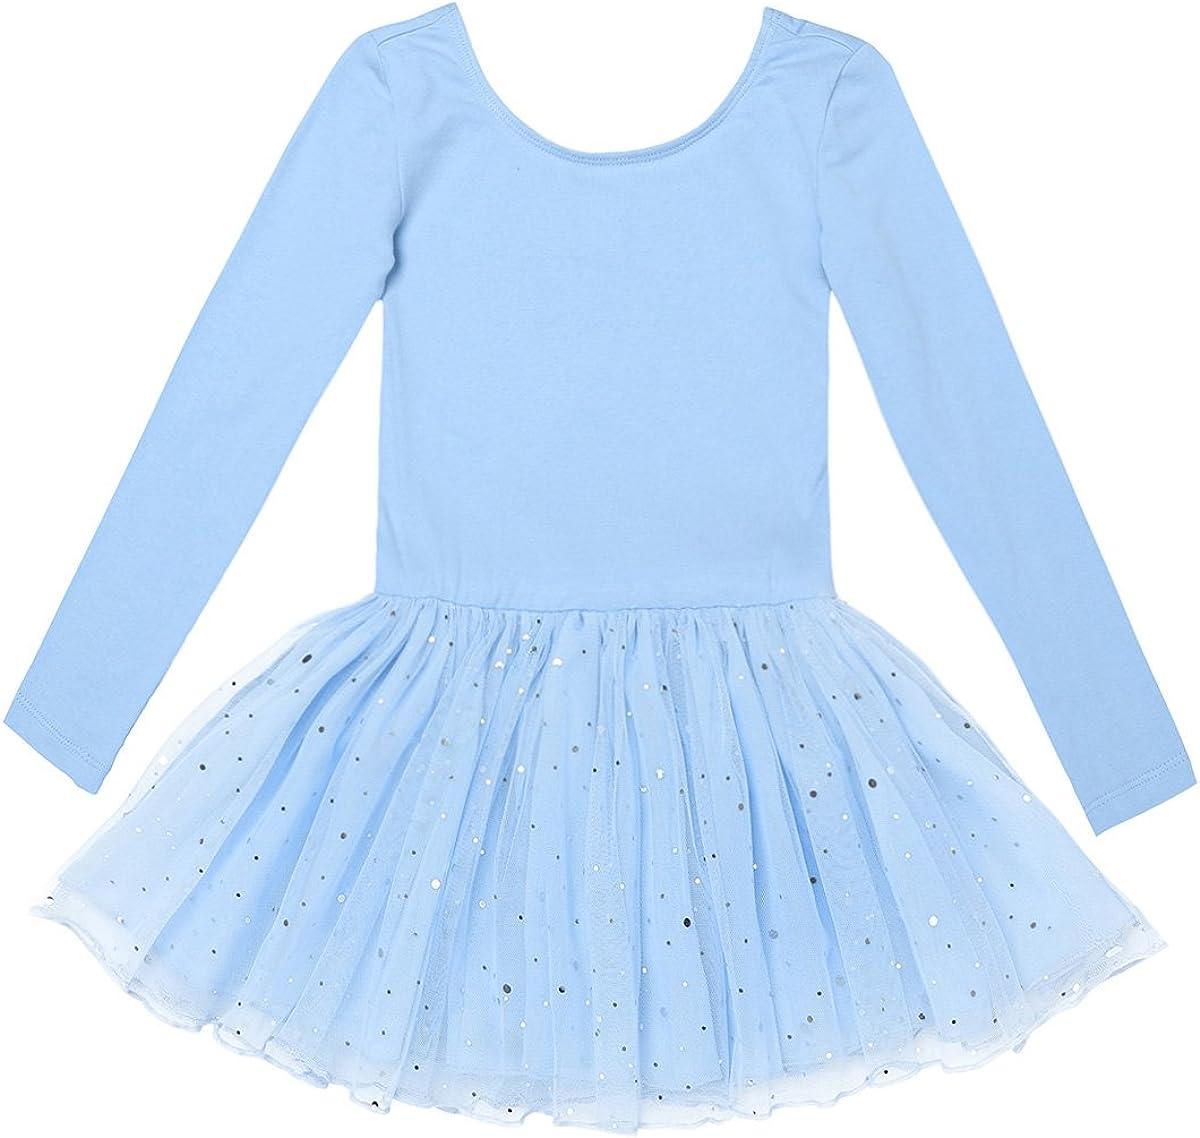 easyforever Kids Girls Long Sleeve Chiffon Ballet Dance Tutu Dress Gymnastic Skating Leotard Skirt Dancing Clothes